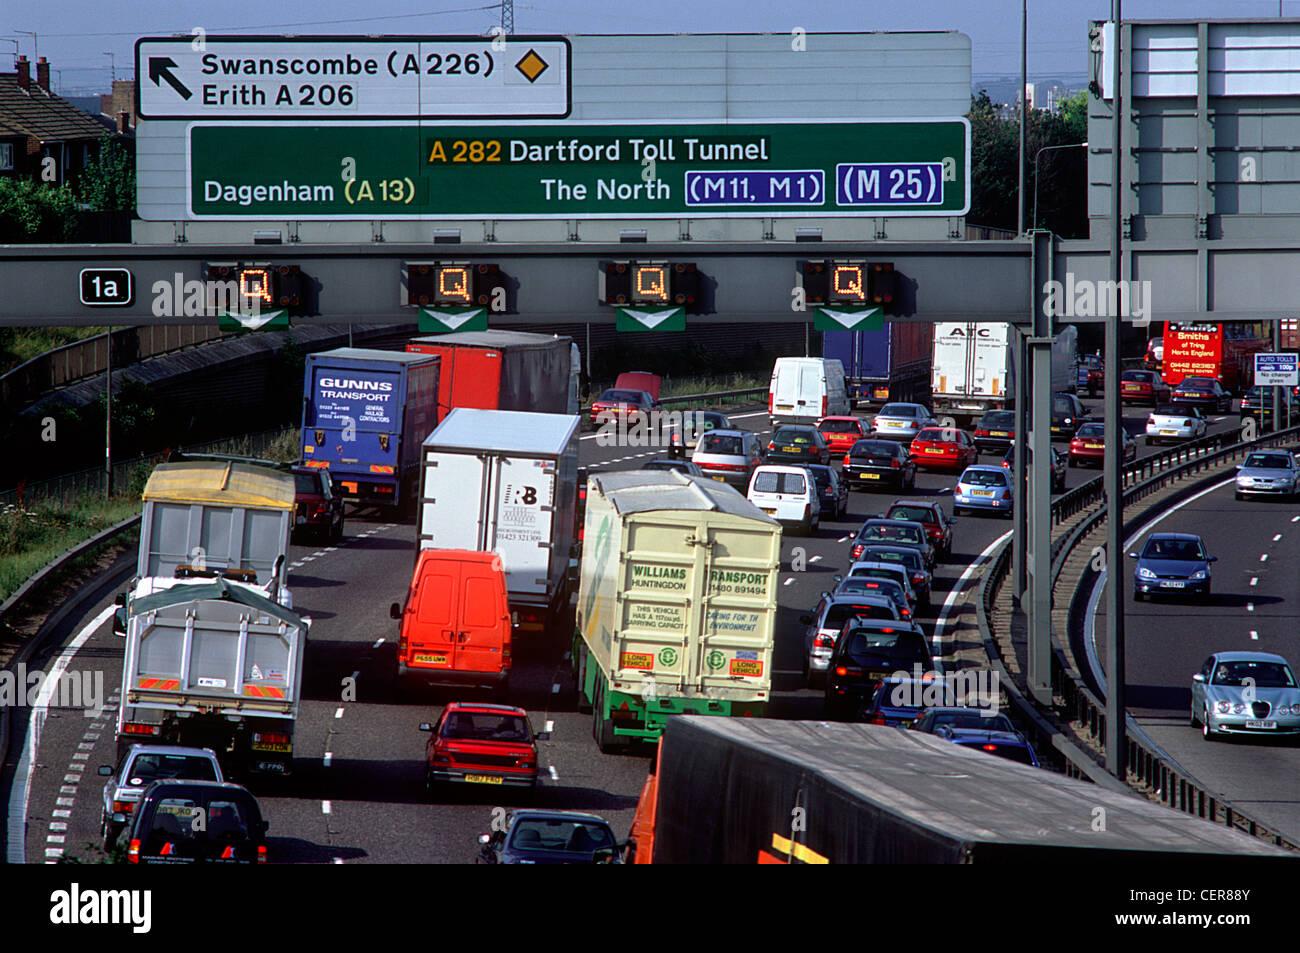 Traffic congestion on the M25 motorway at Dartford. - Stock Image